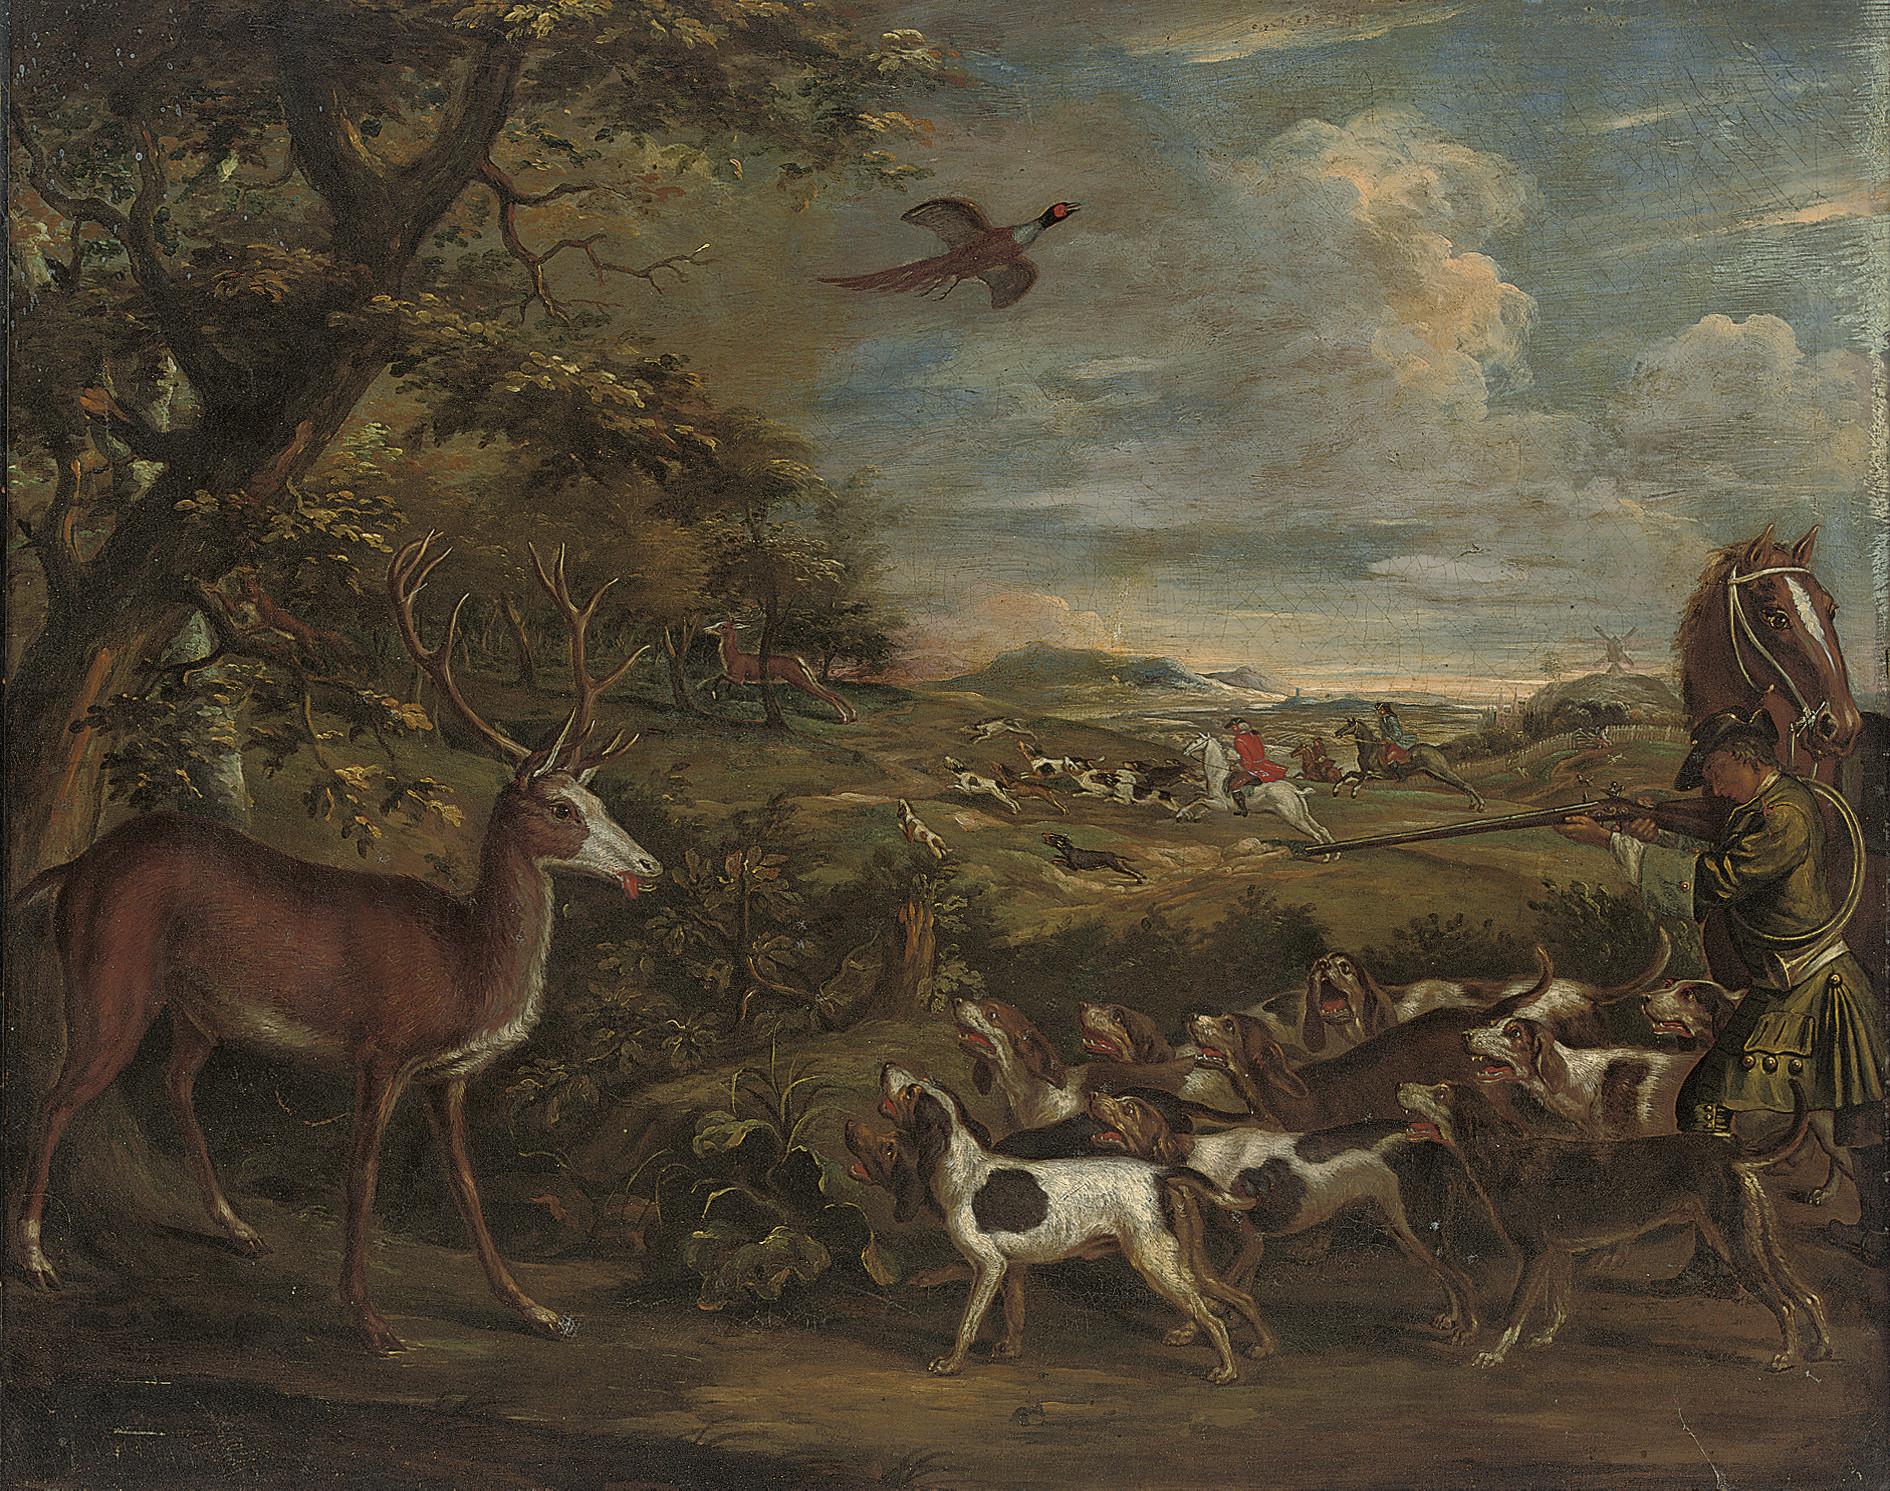 Circle of Jan Wyck (1652-1700)